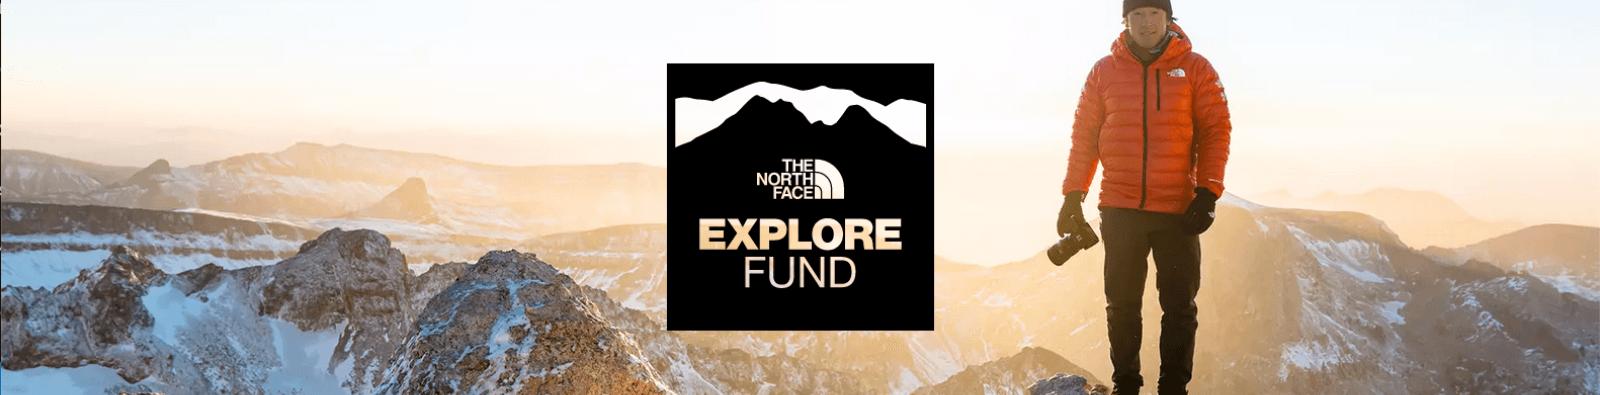 The North Face Explore Fund